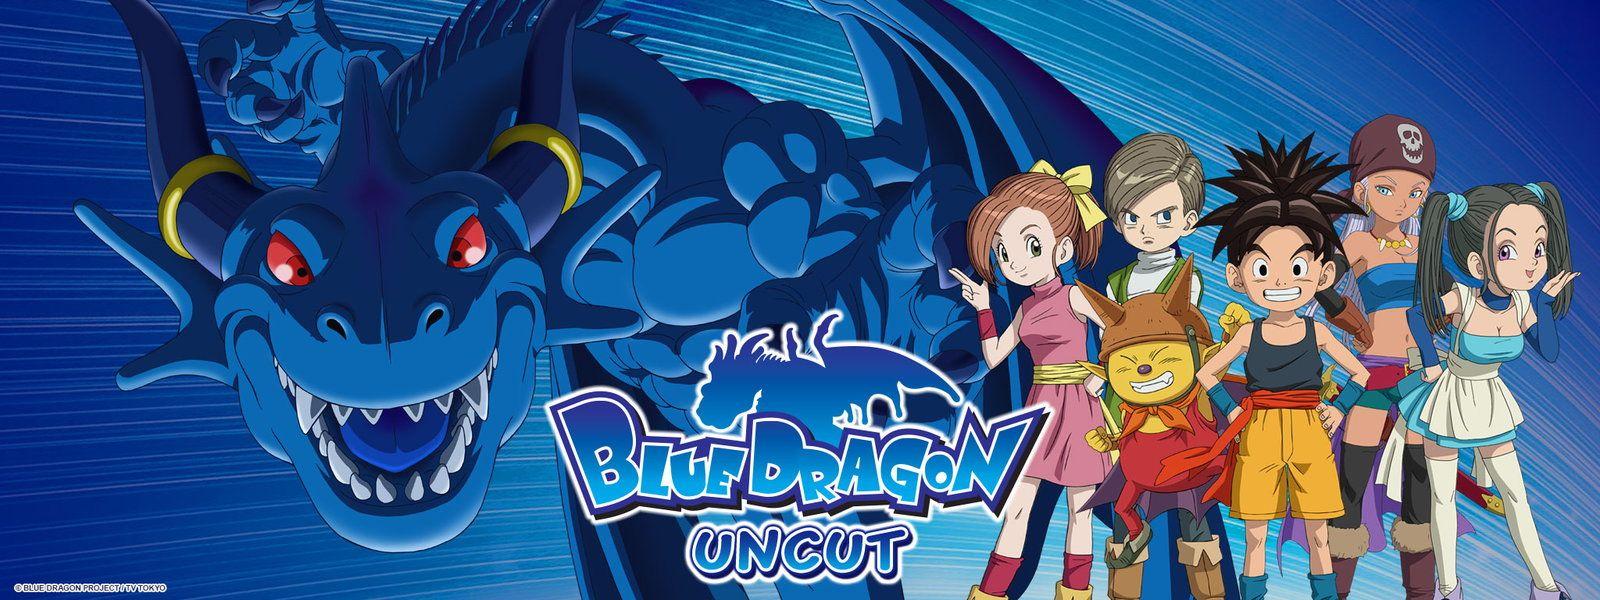 Watch Blue Dragon Uncut Online at Hulu Blue dragon